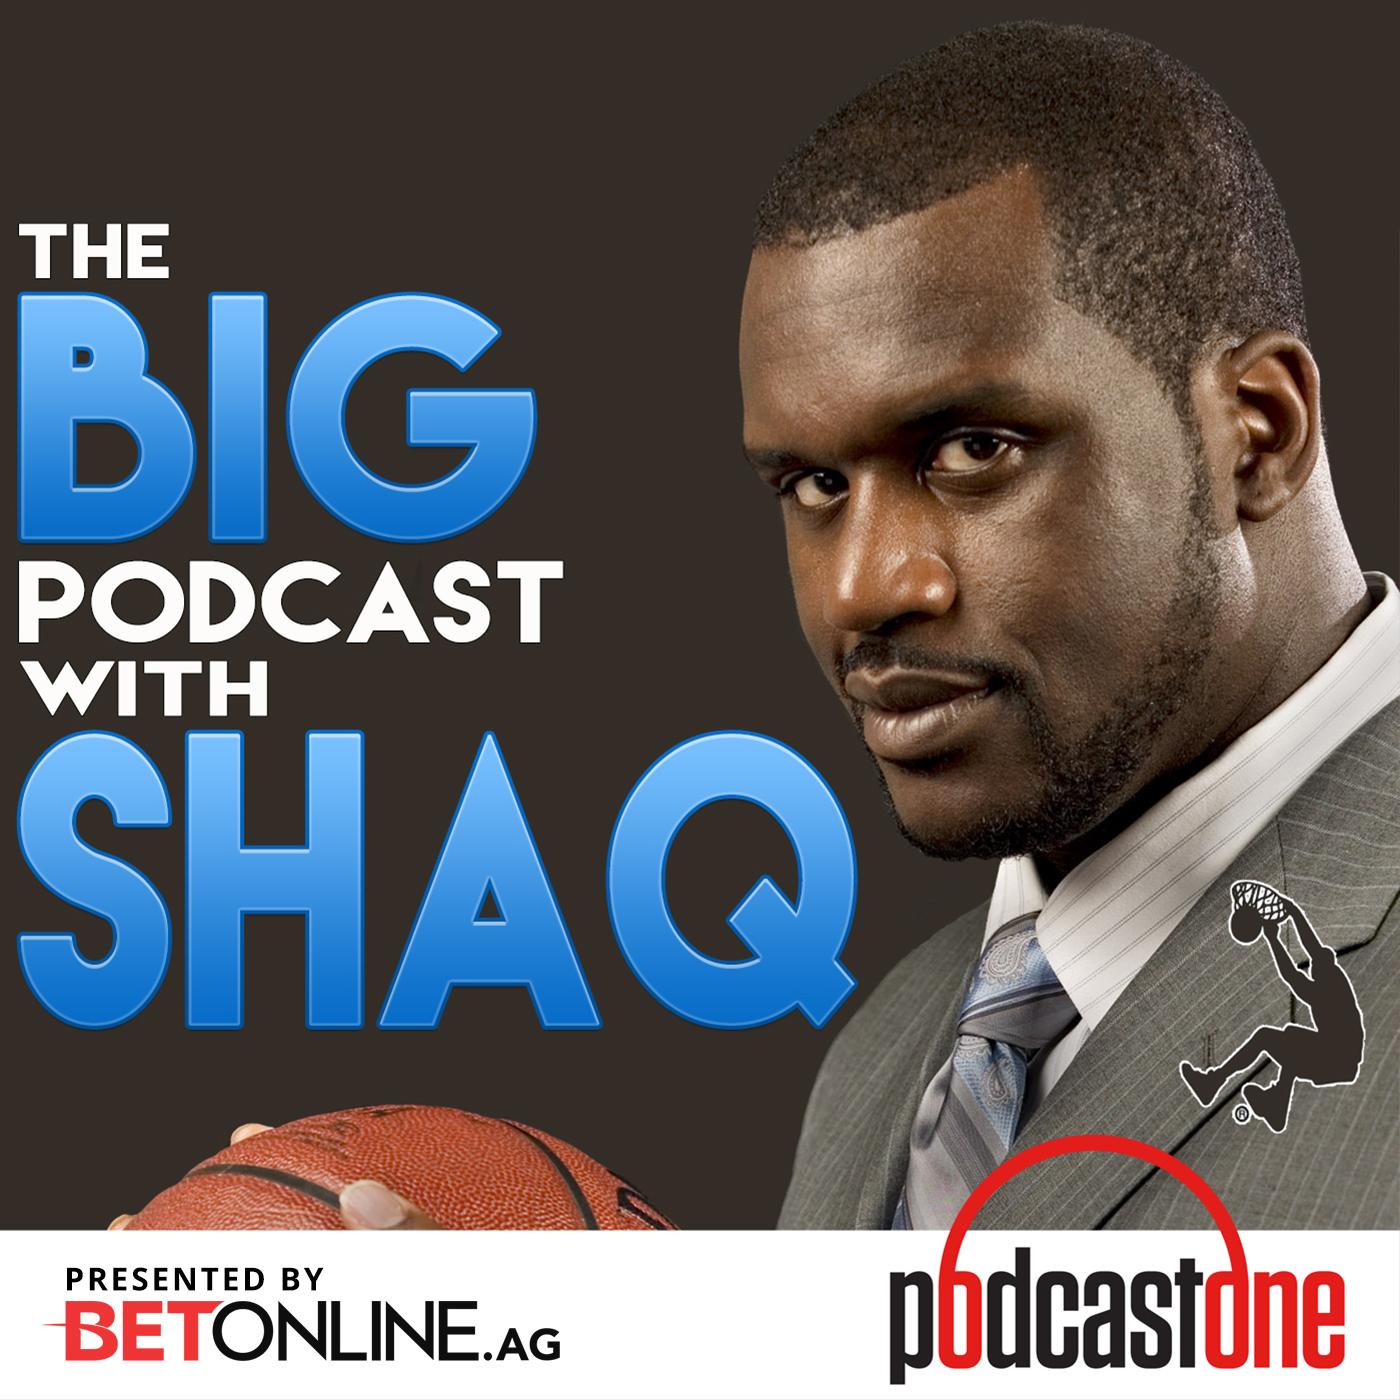 Big shaq podcast